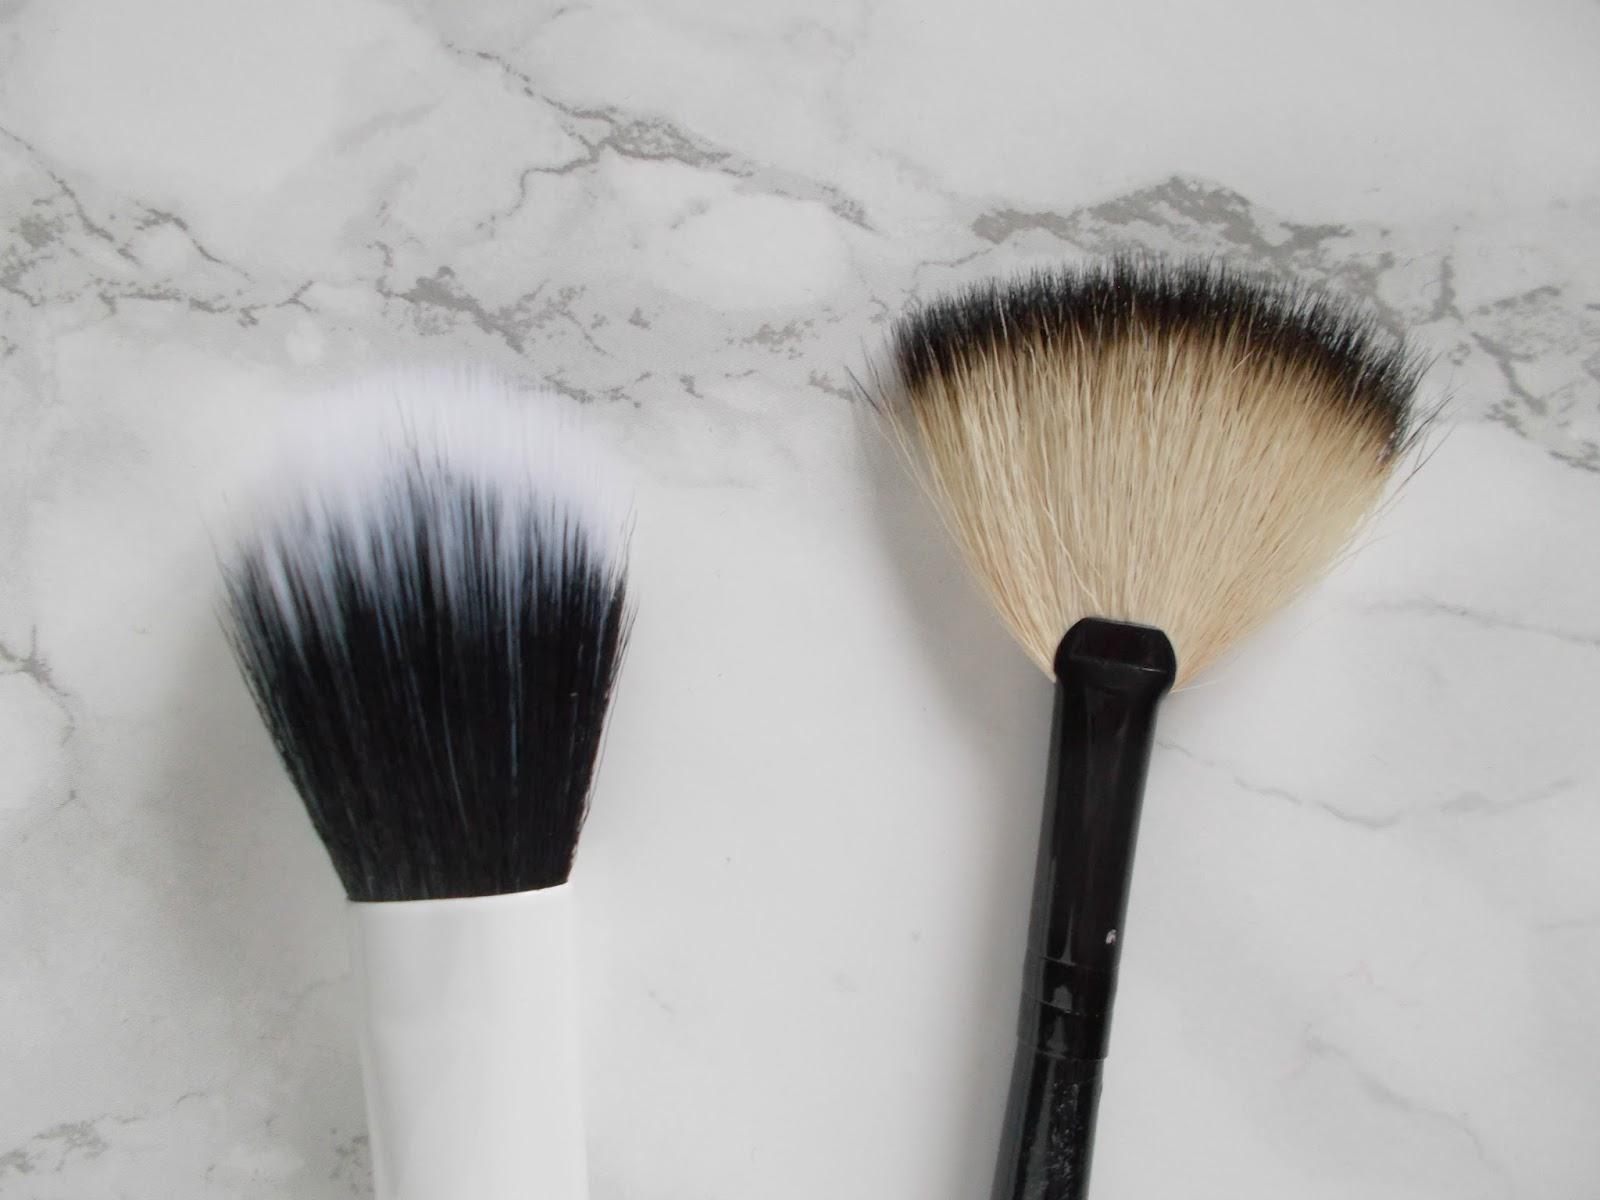 real techniques duo fibre face brush morphe badger deluxe fan brush review